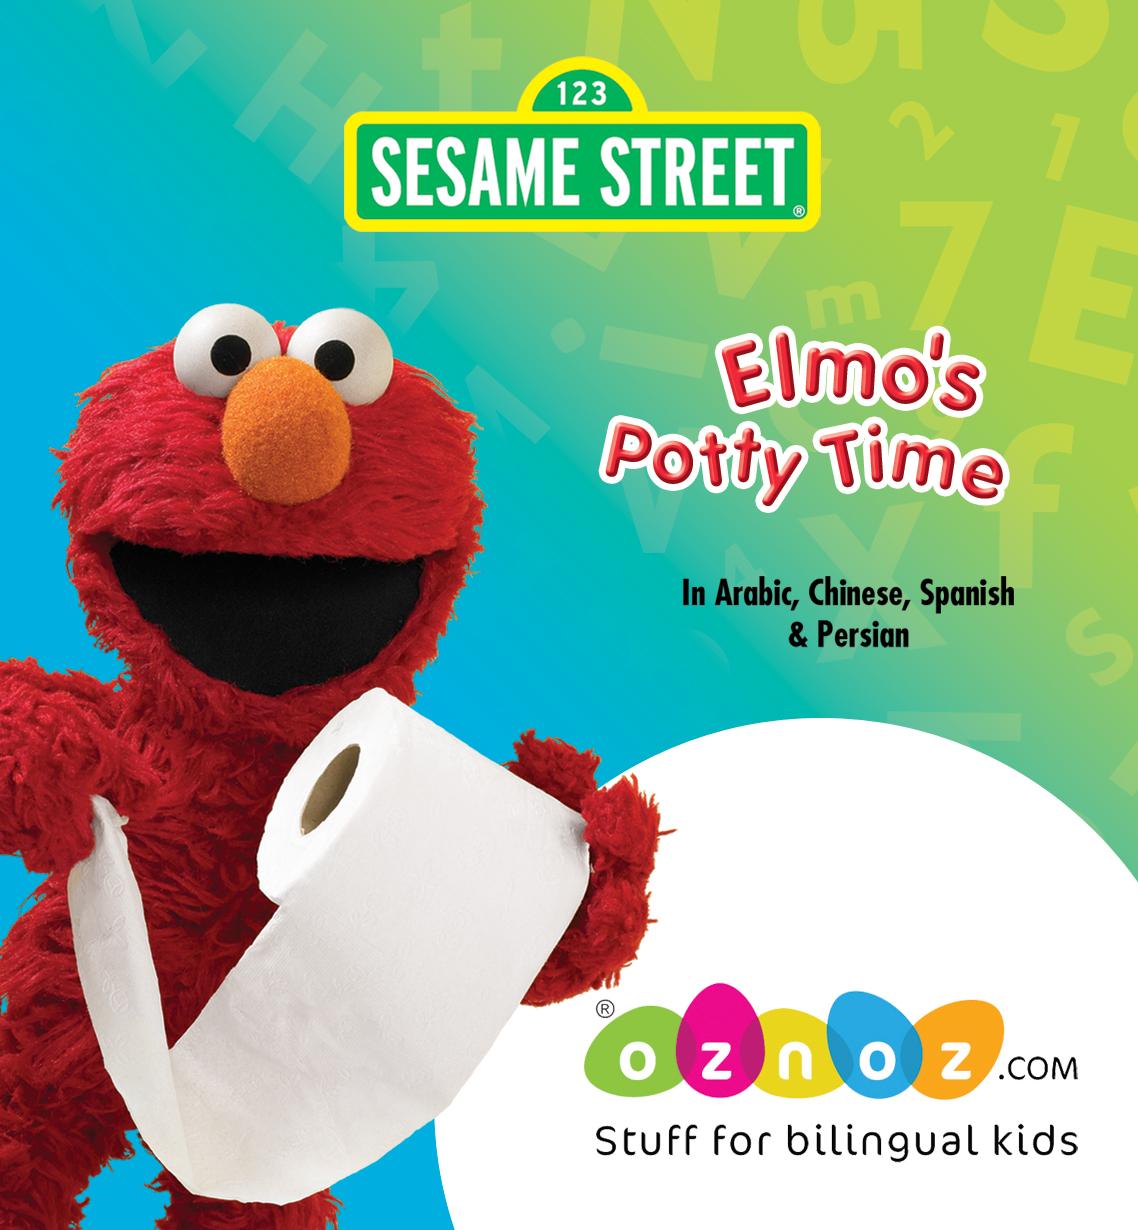 sesame street backs multilingual platform oznoz  u00bb kidscreen